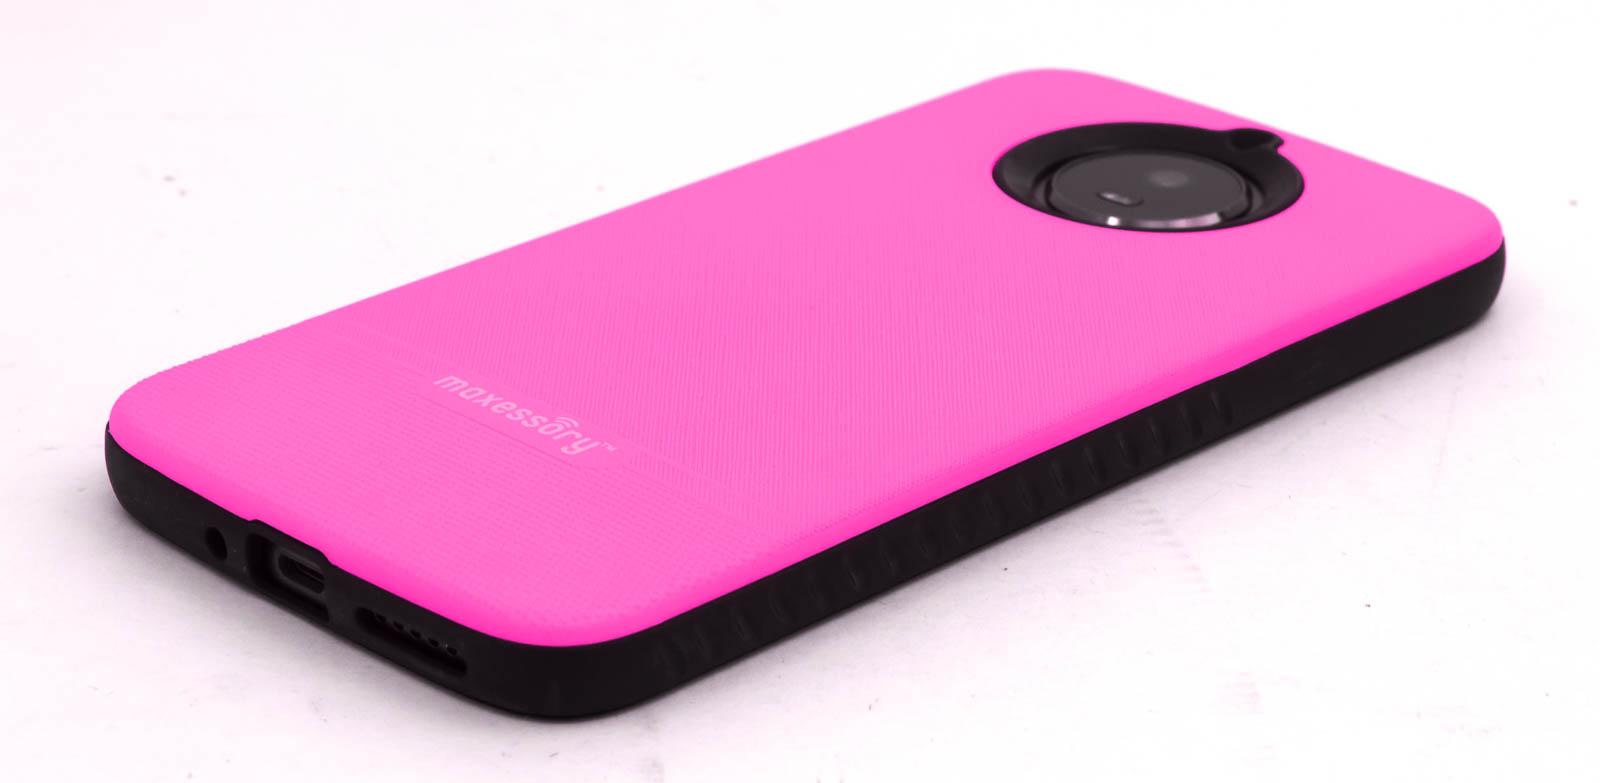 Moto-G5s-Case-Moto-G6-Case-Ultra-Thin-Hard-Body-Tactile-Shell-Cover thumbnail 13